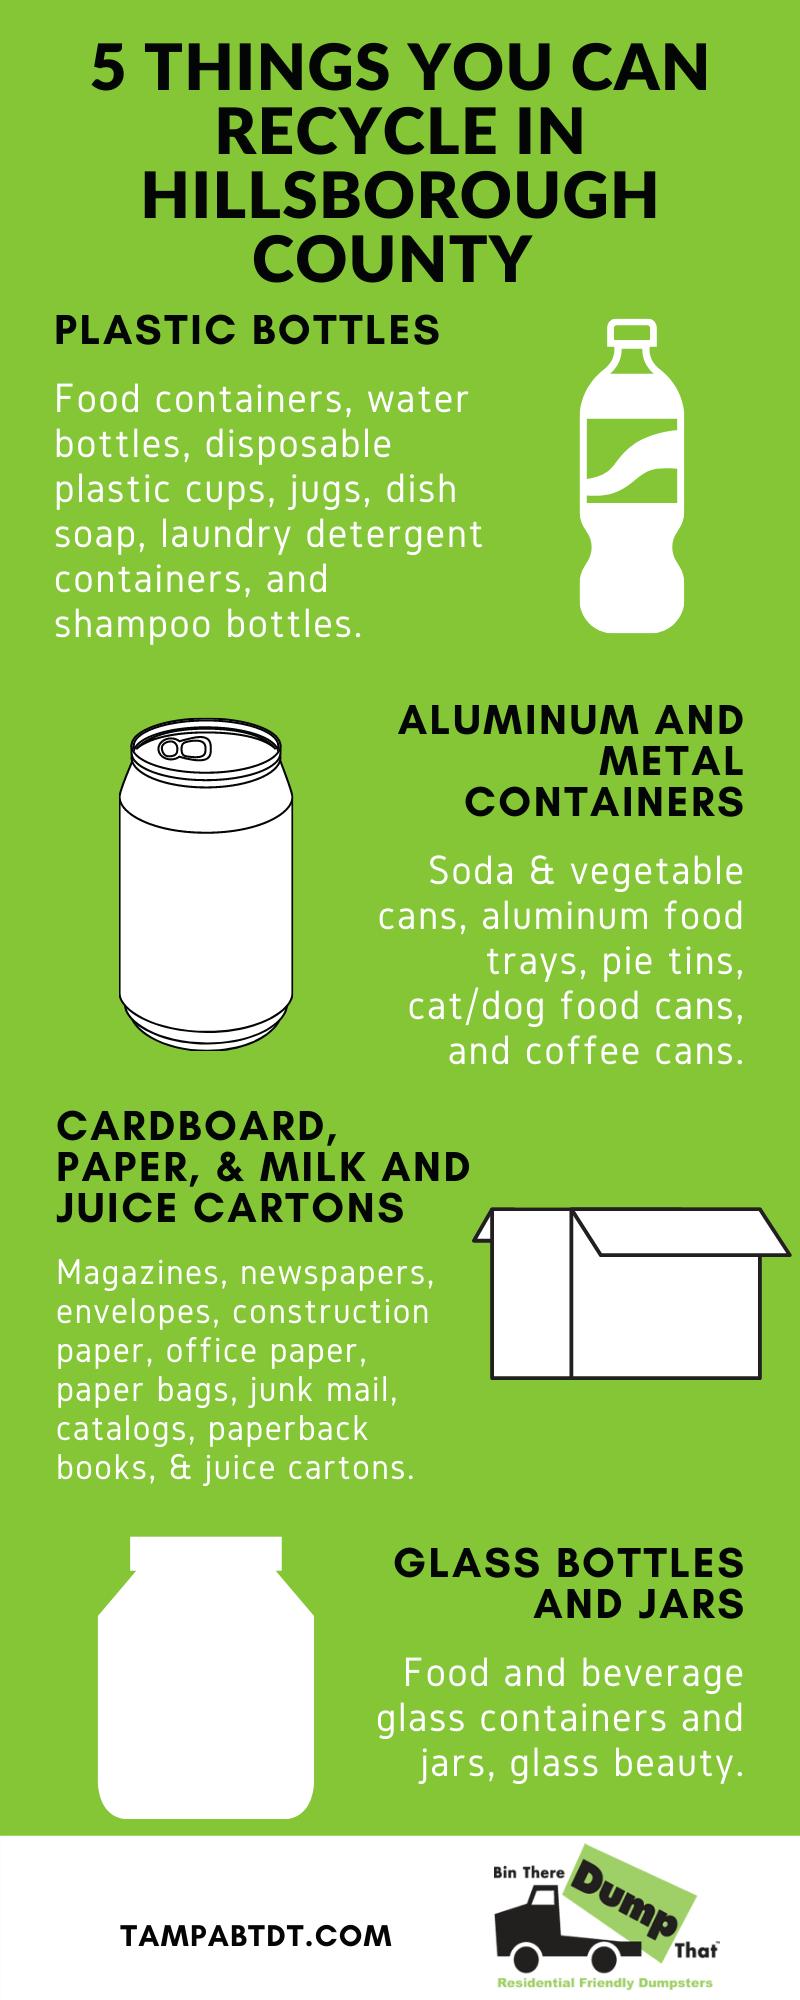 Hillsborough County Recycling